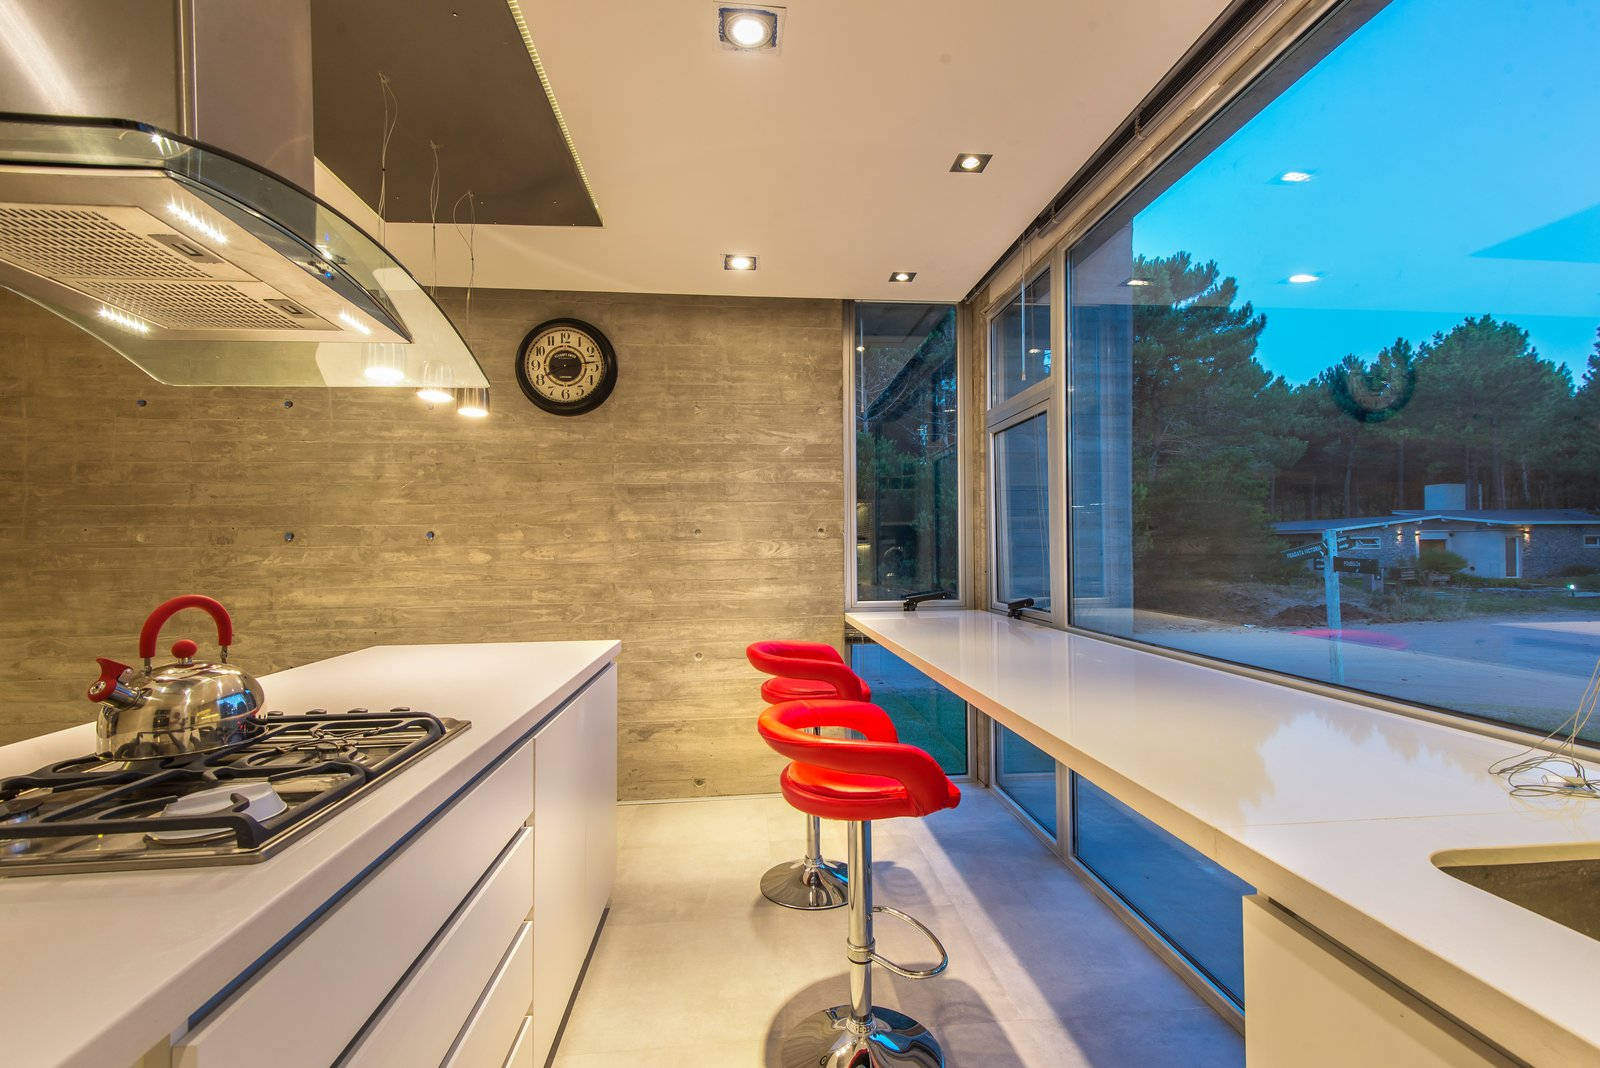 Tagged: Kitchen, White Cabinet, Concrete Backsplashe, Quartzite Counter, Porcelain Tile Floor, Cooktops, Ceiling Lighting, and Drop In Sink.  Casa Batin by Estudio Galera